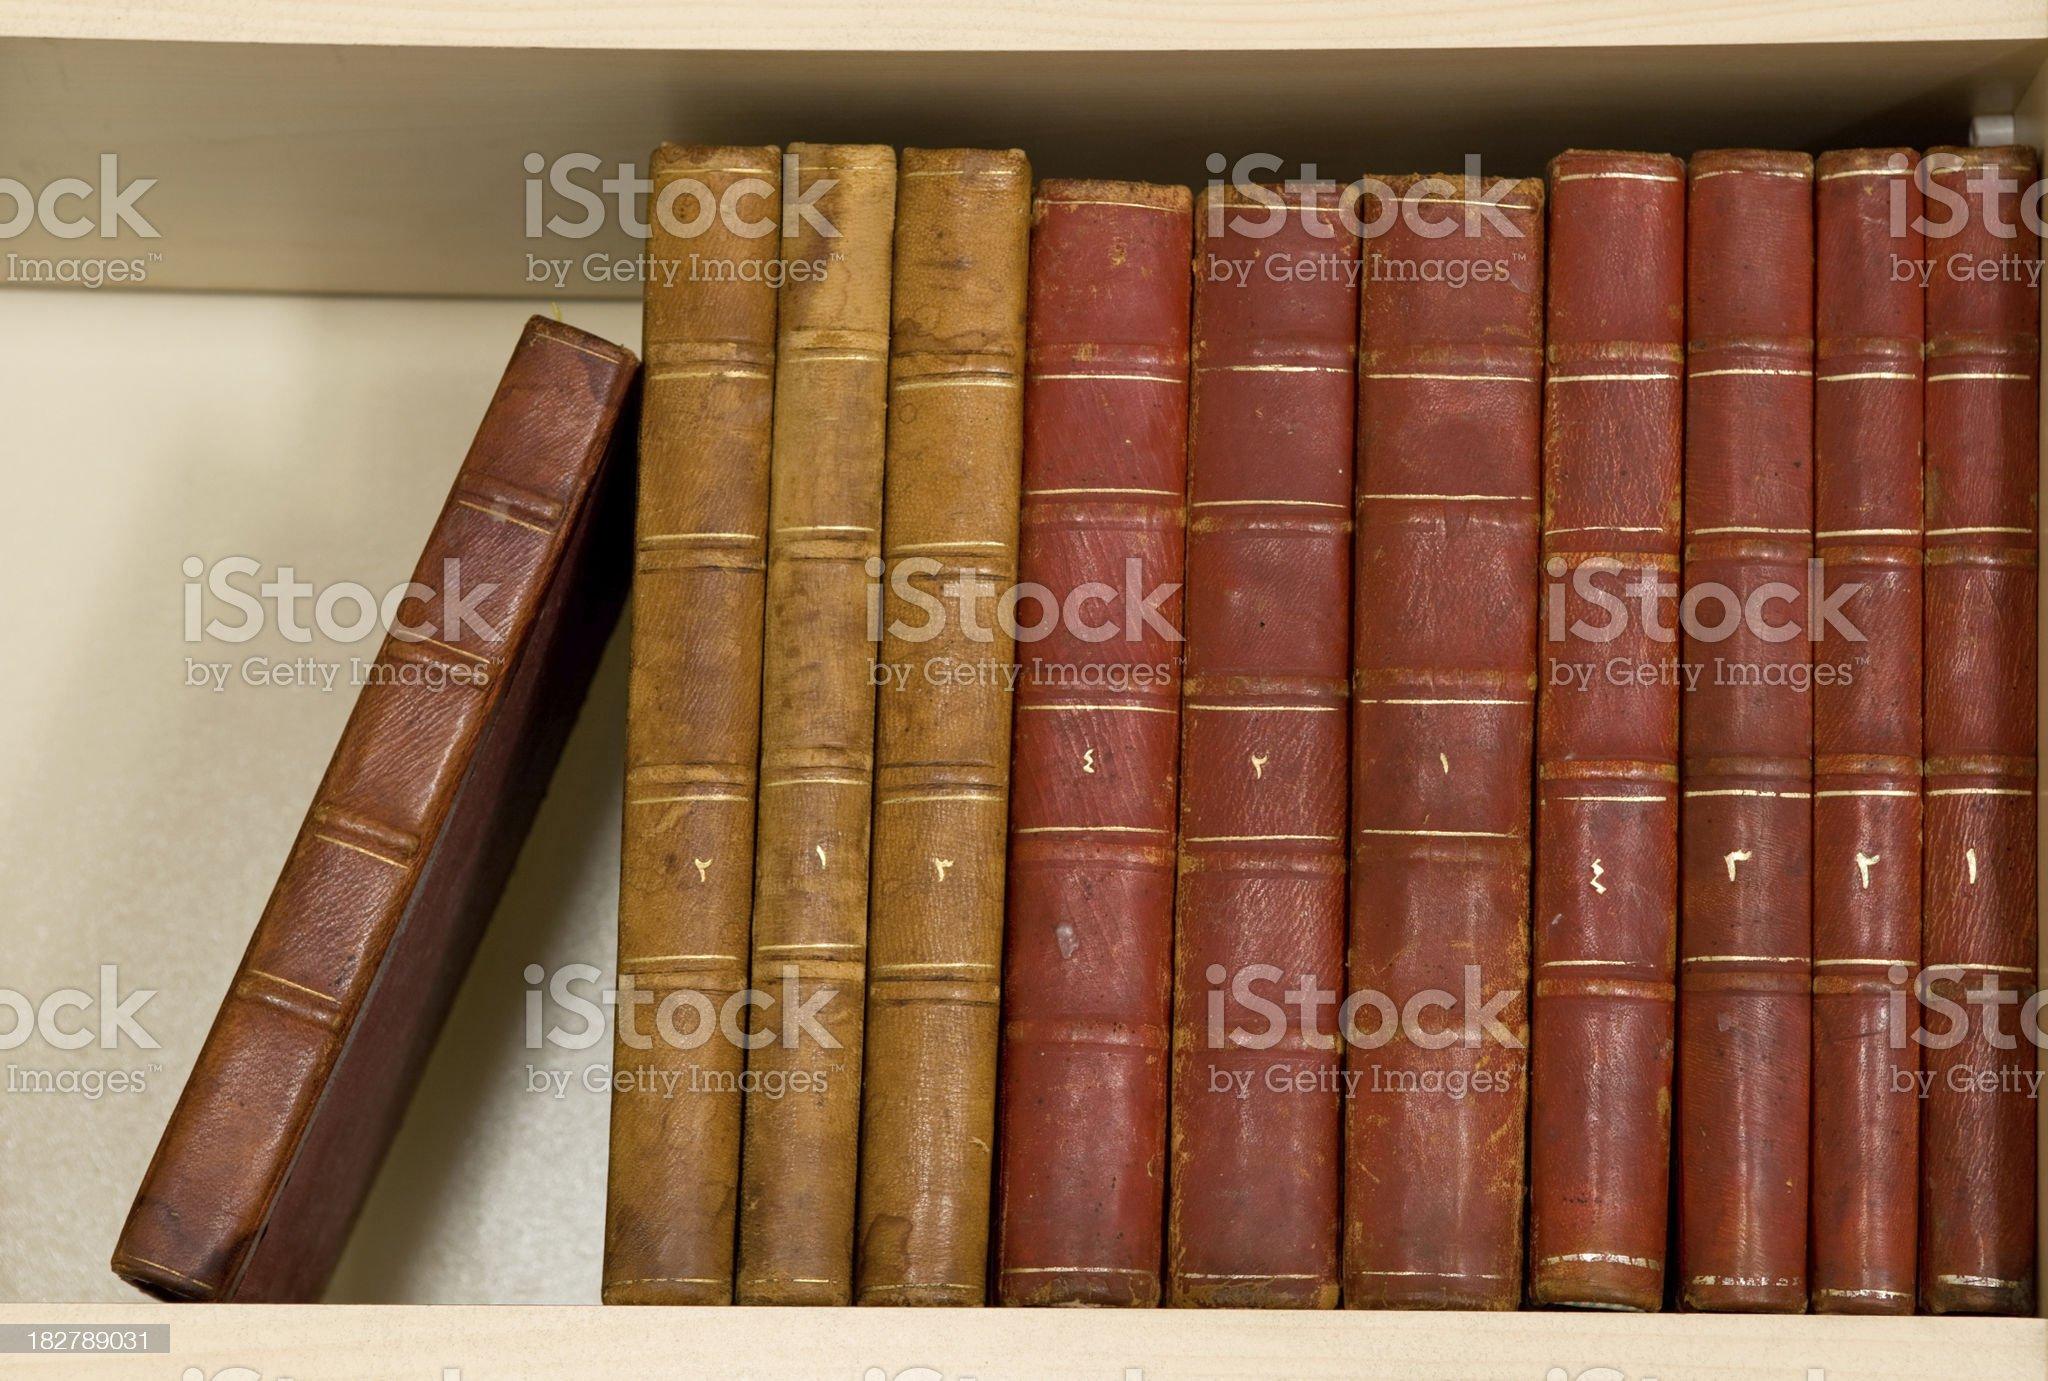 Hardcover books royalty-free stock photo